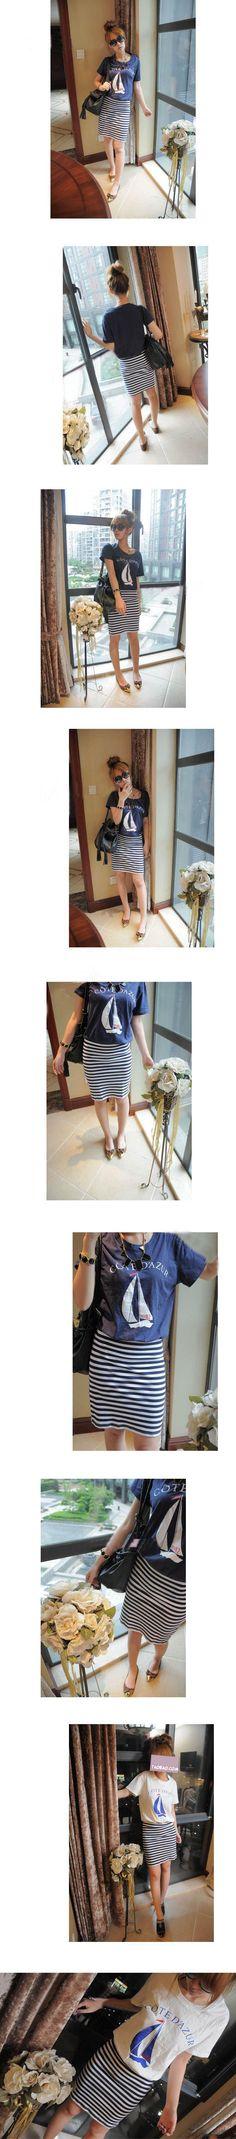 Fashion Fashion Styles, Shoe Rack, Asian, Shoe Racks, Style Fashion